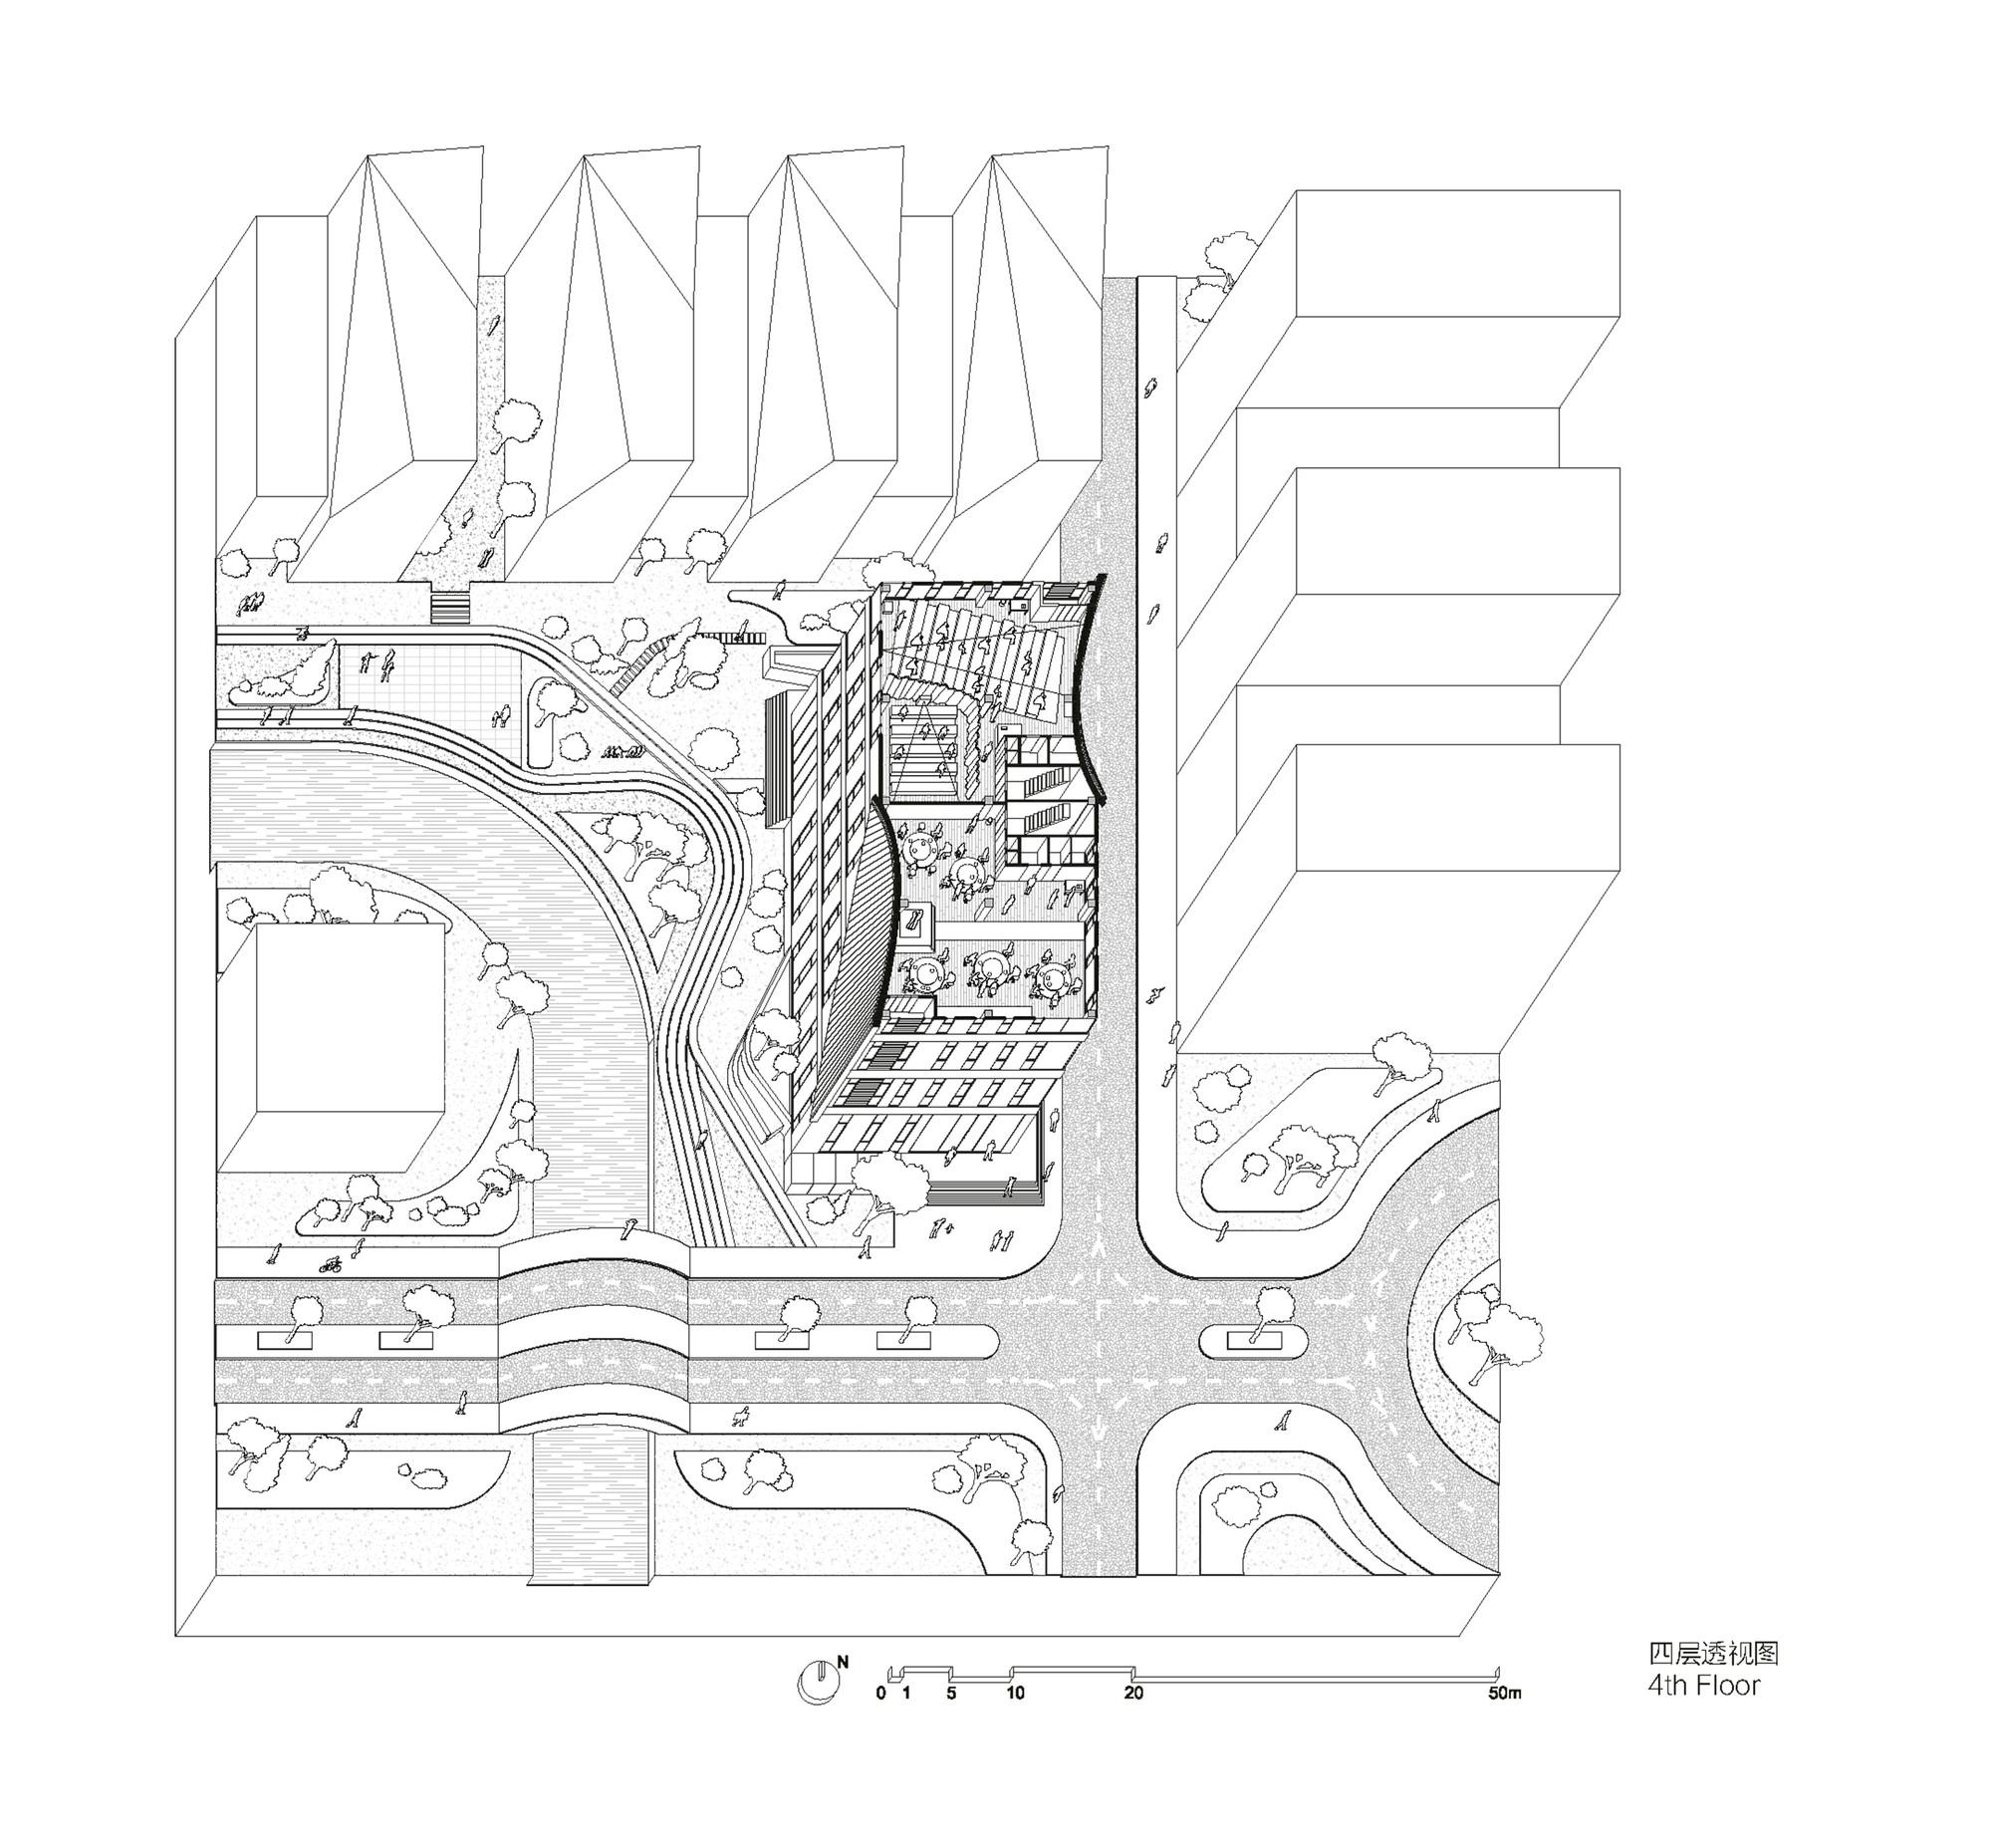 hight resolution of fourth floor plan